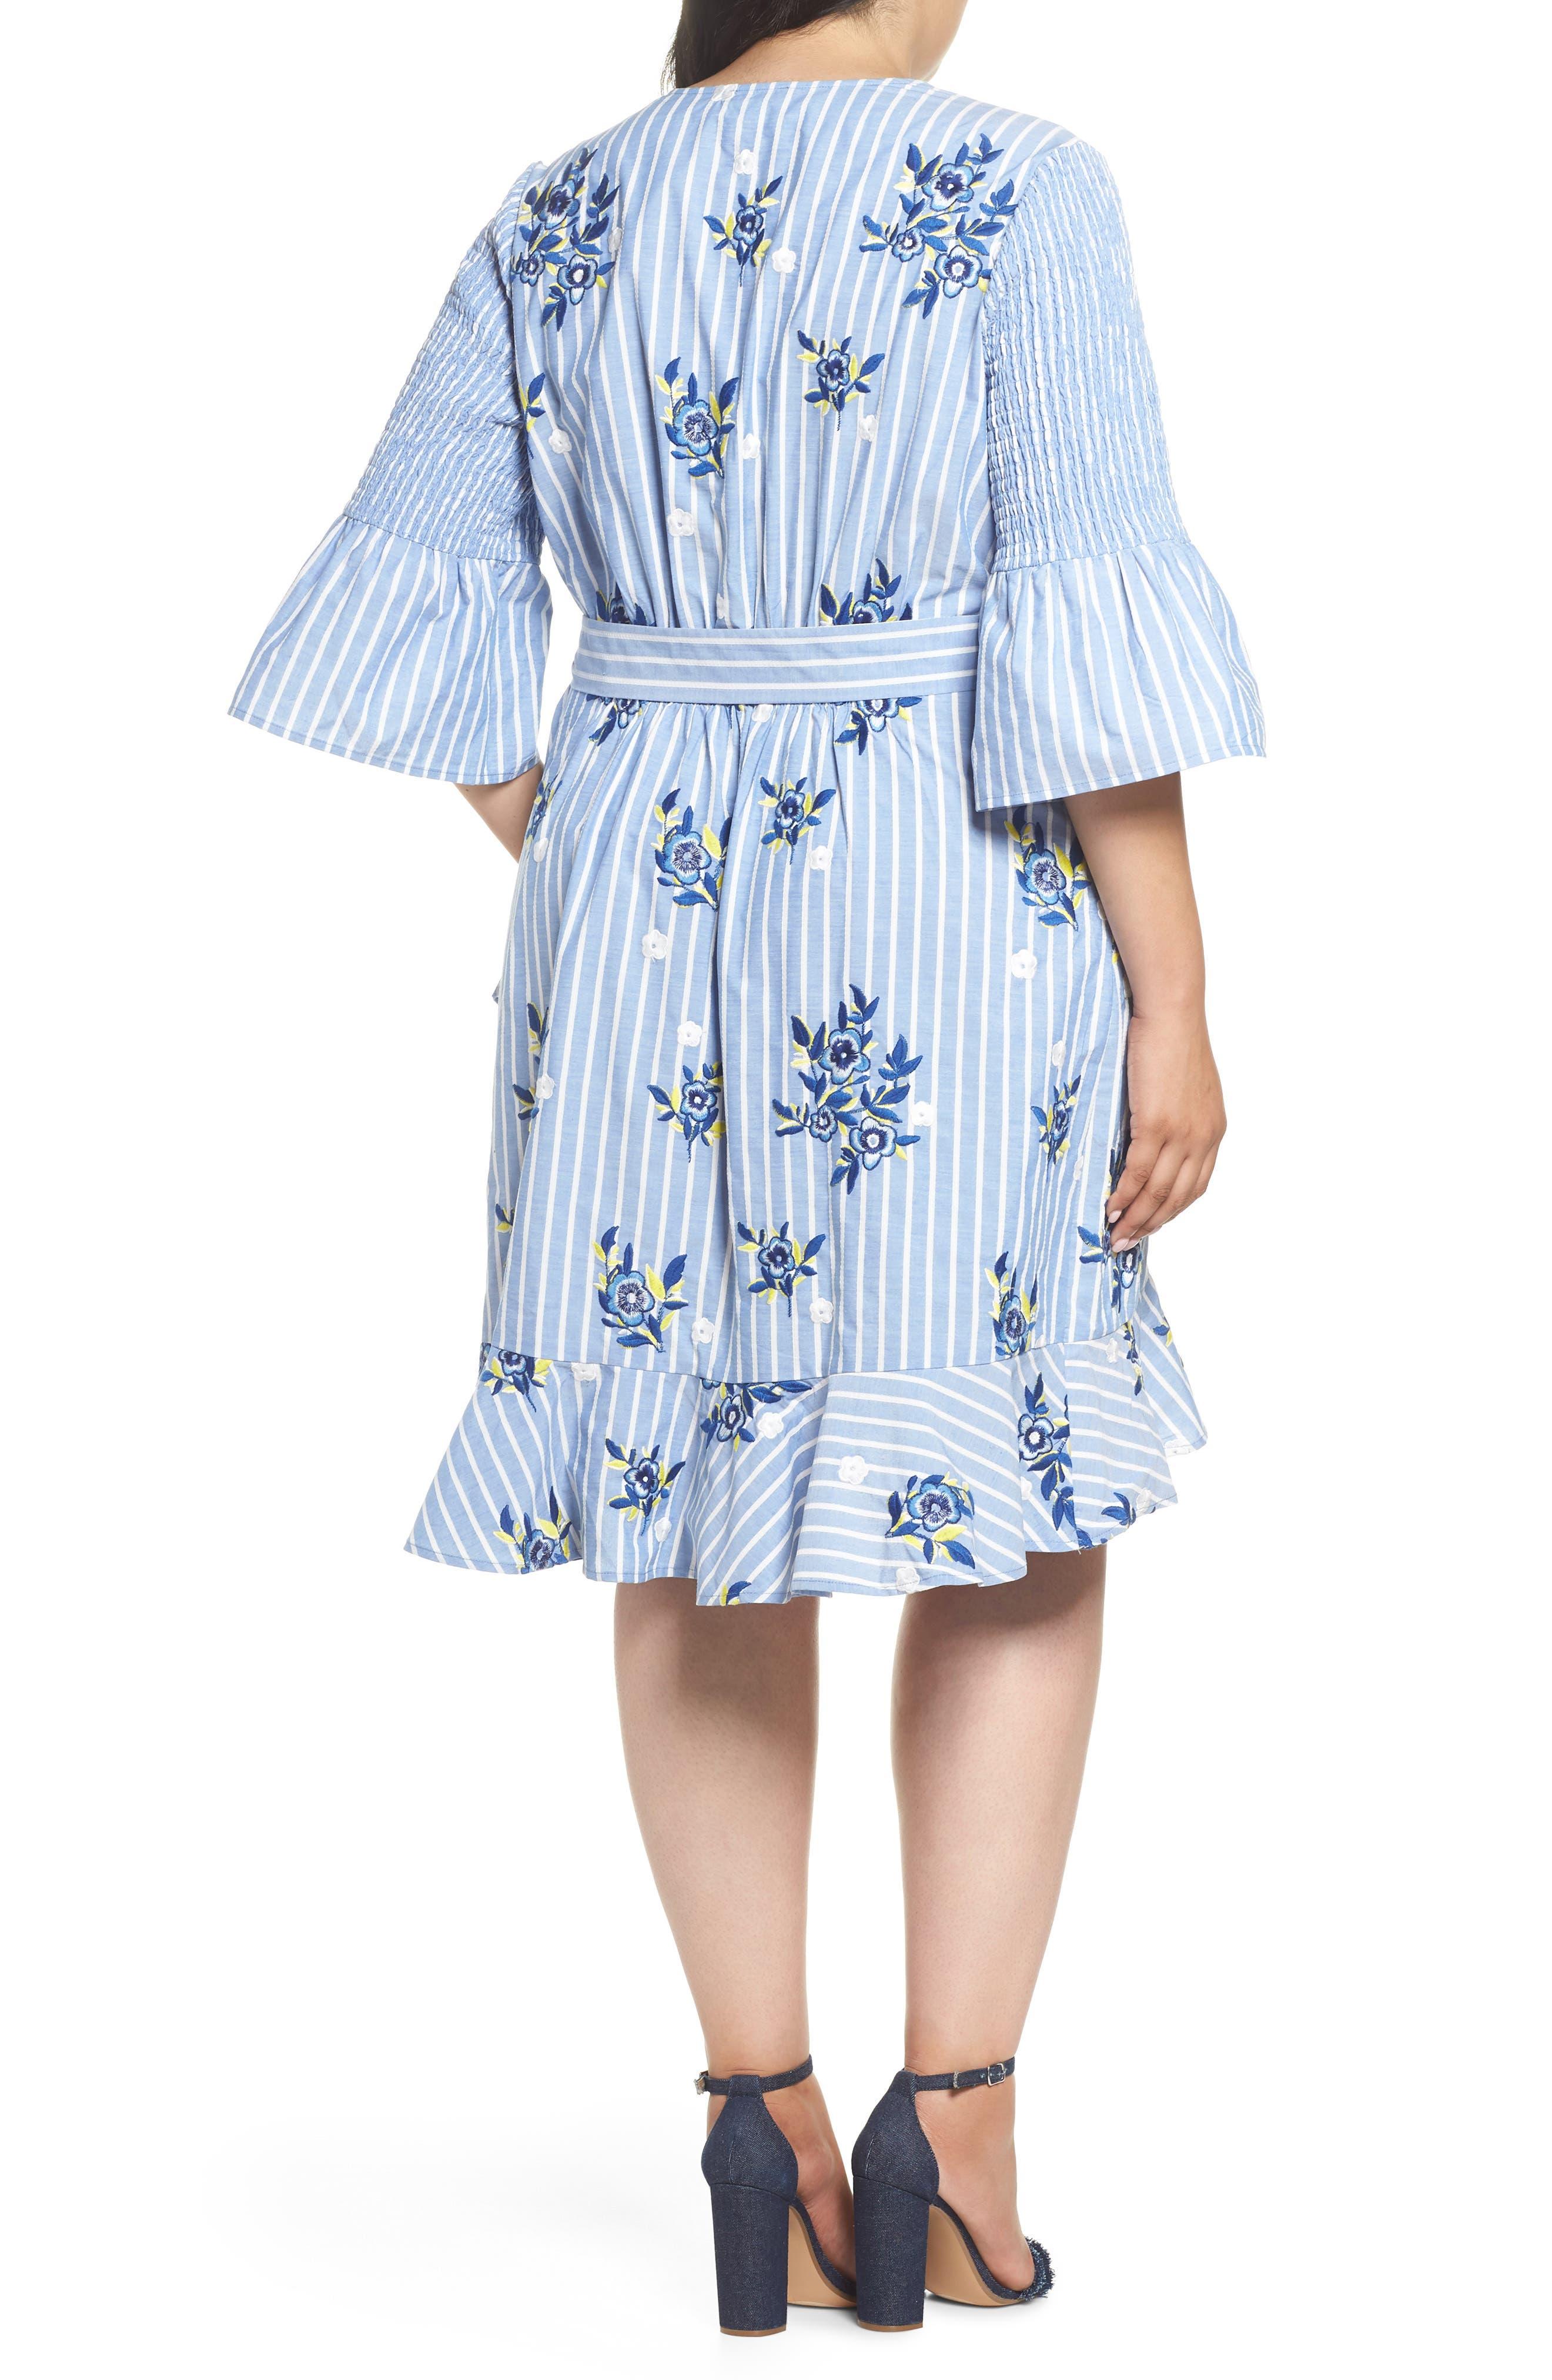 Embroidered Stripe Wrap Dress,                             Alternate thumbnail 2, color,                             Blue/ White